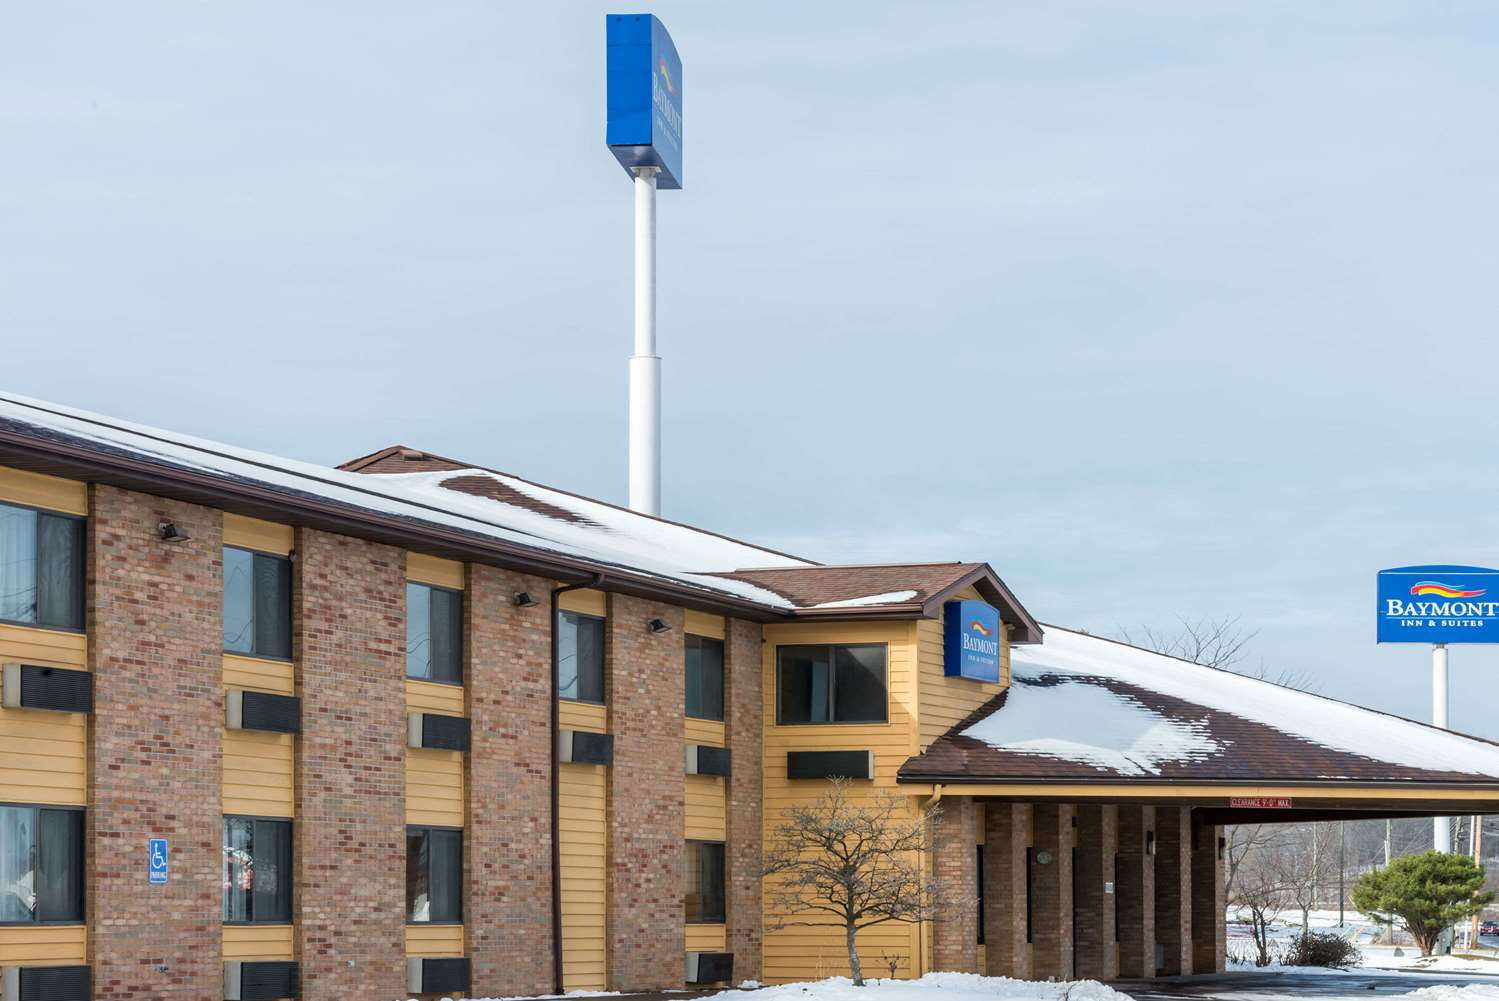 Baymont Inn & Suites Cambridge